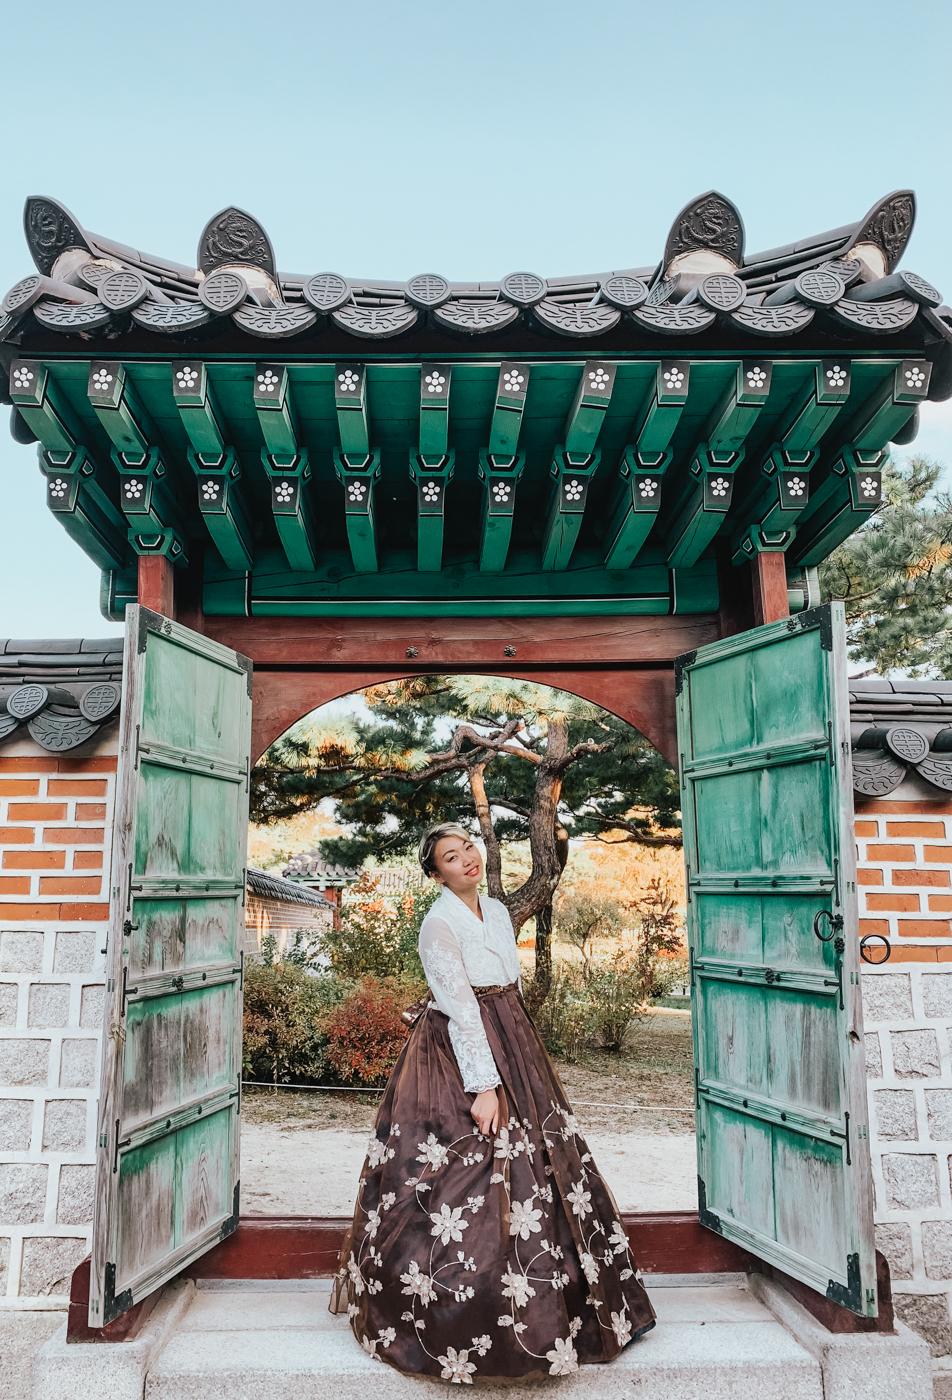 Gyeongbokgung and Hanbok | Seoul, Korea Travel Guide | The Chic Diary